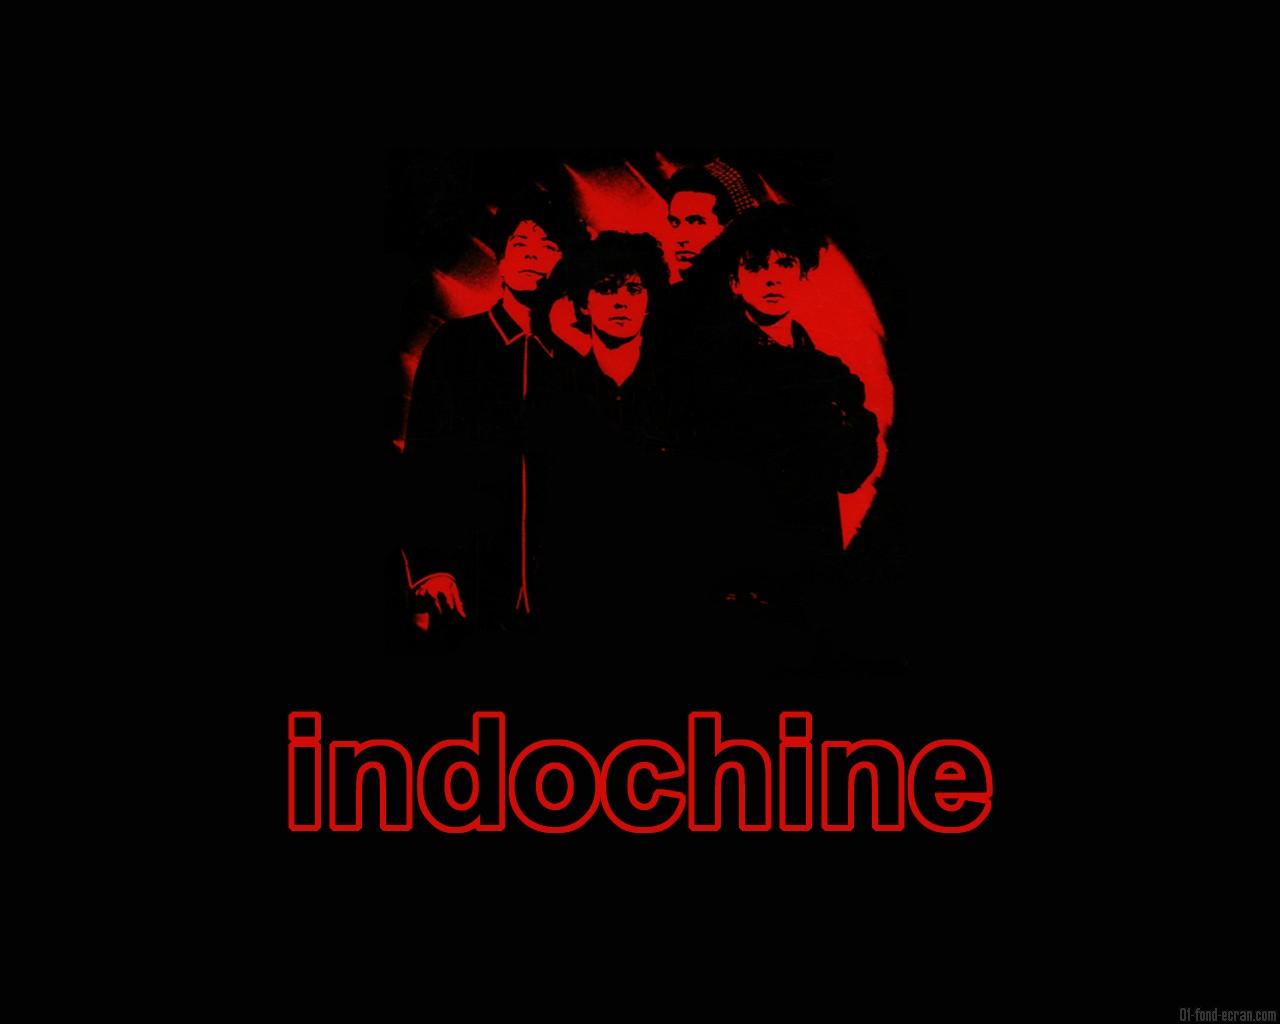 Indochine Et Ns Fond D Ecran Indochine 1280x1024 Wallpaper Teahub Io